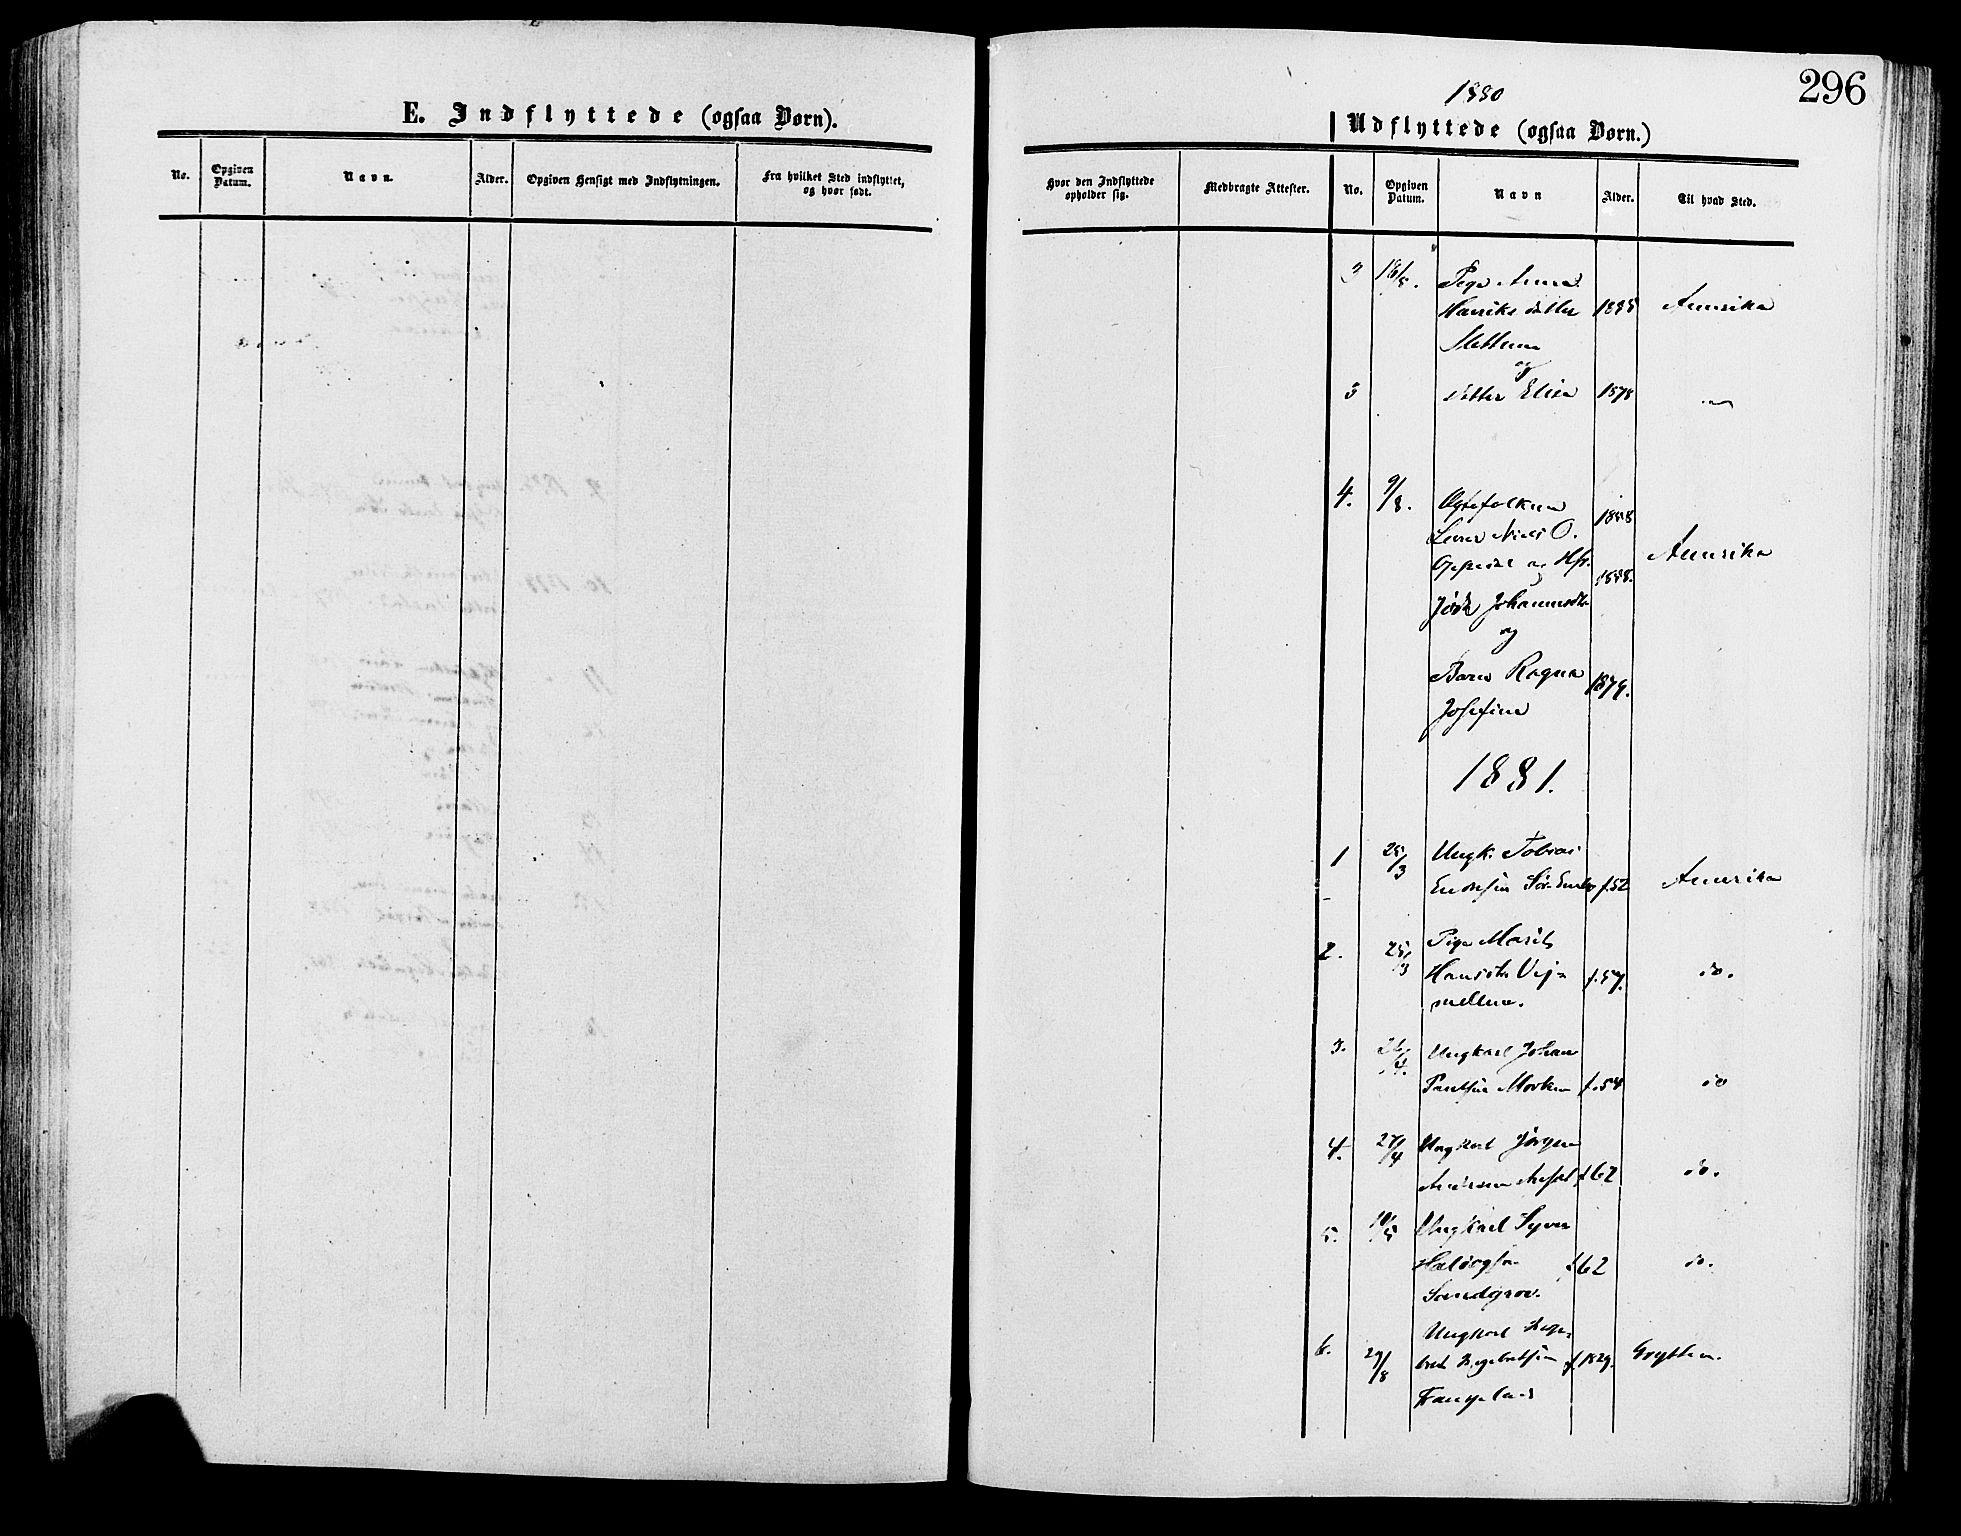 SAH, Lesja prestekontor, Ministerialbok nr. 9, 1854-1889, s. 296